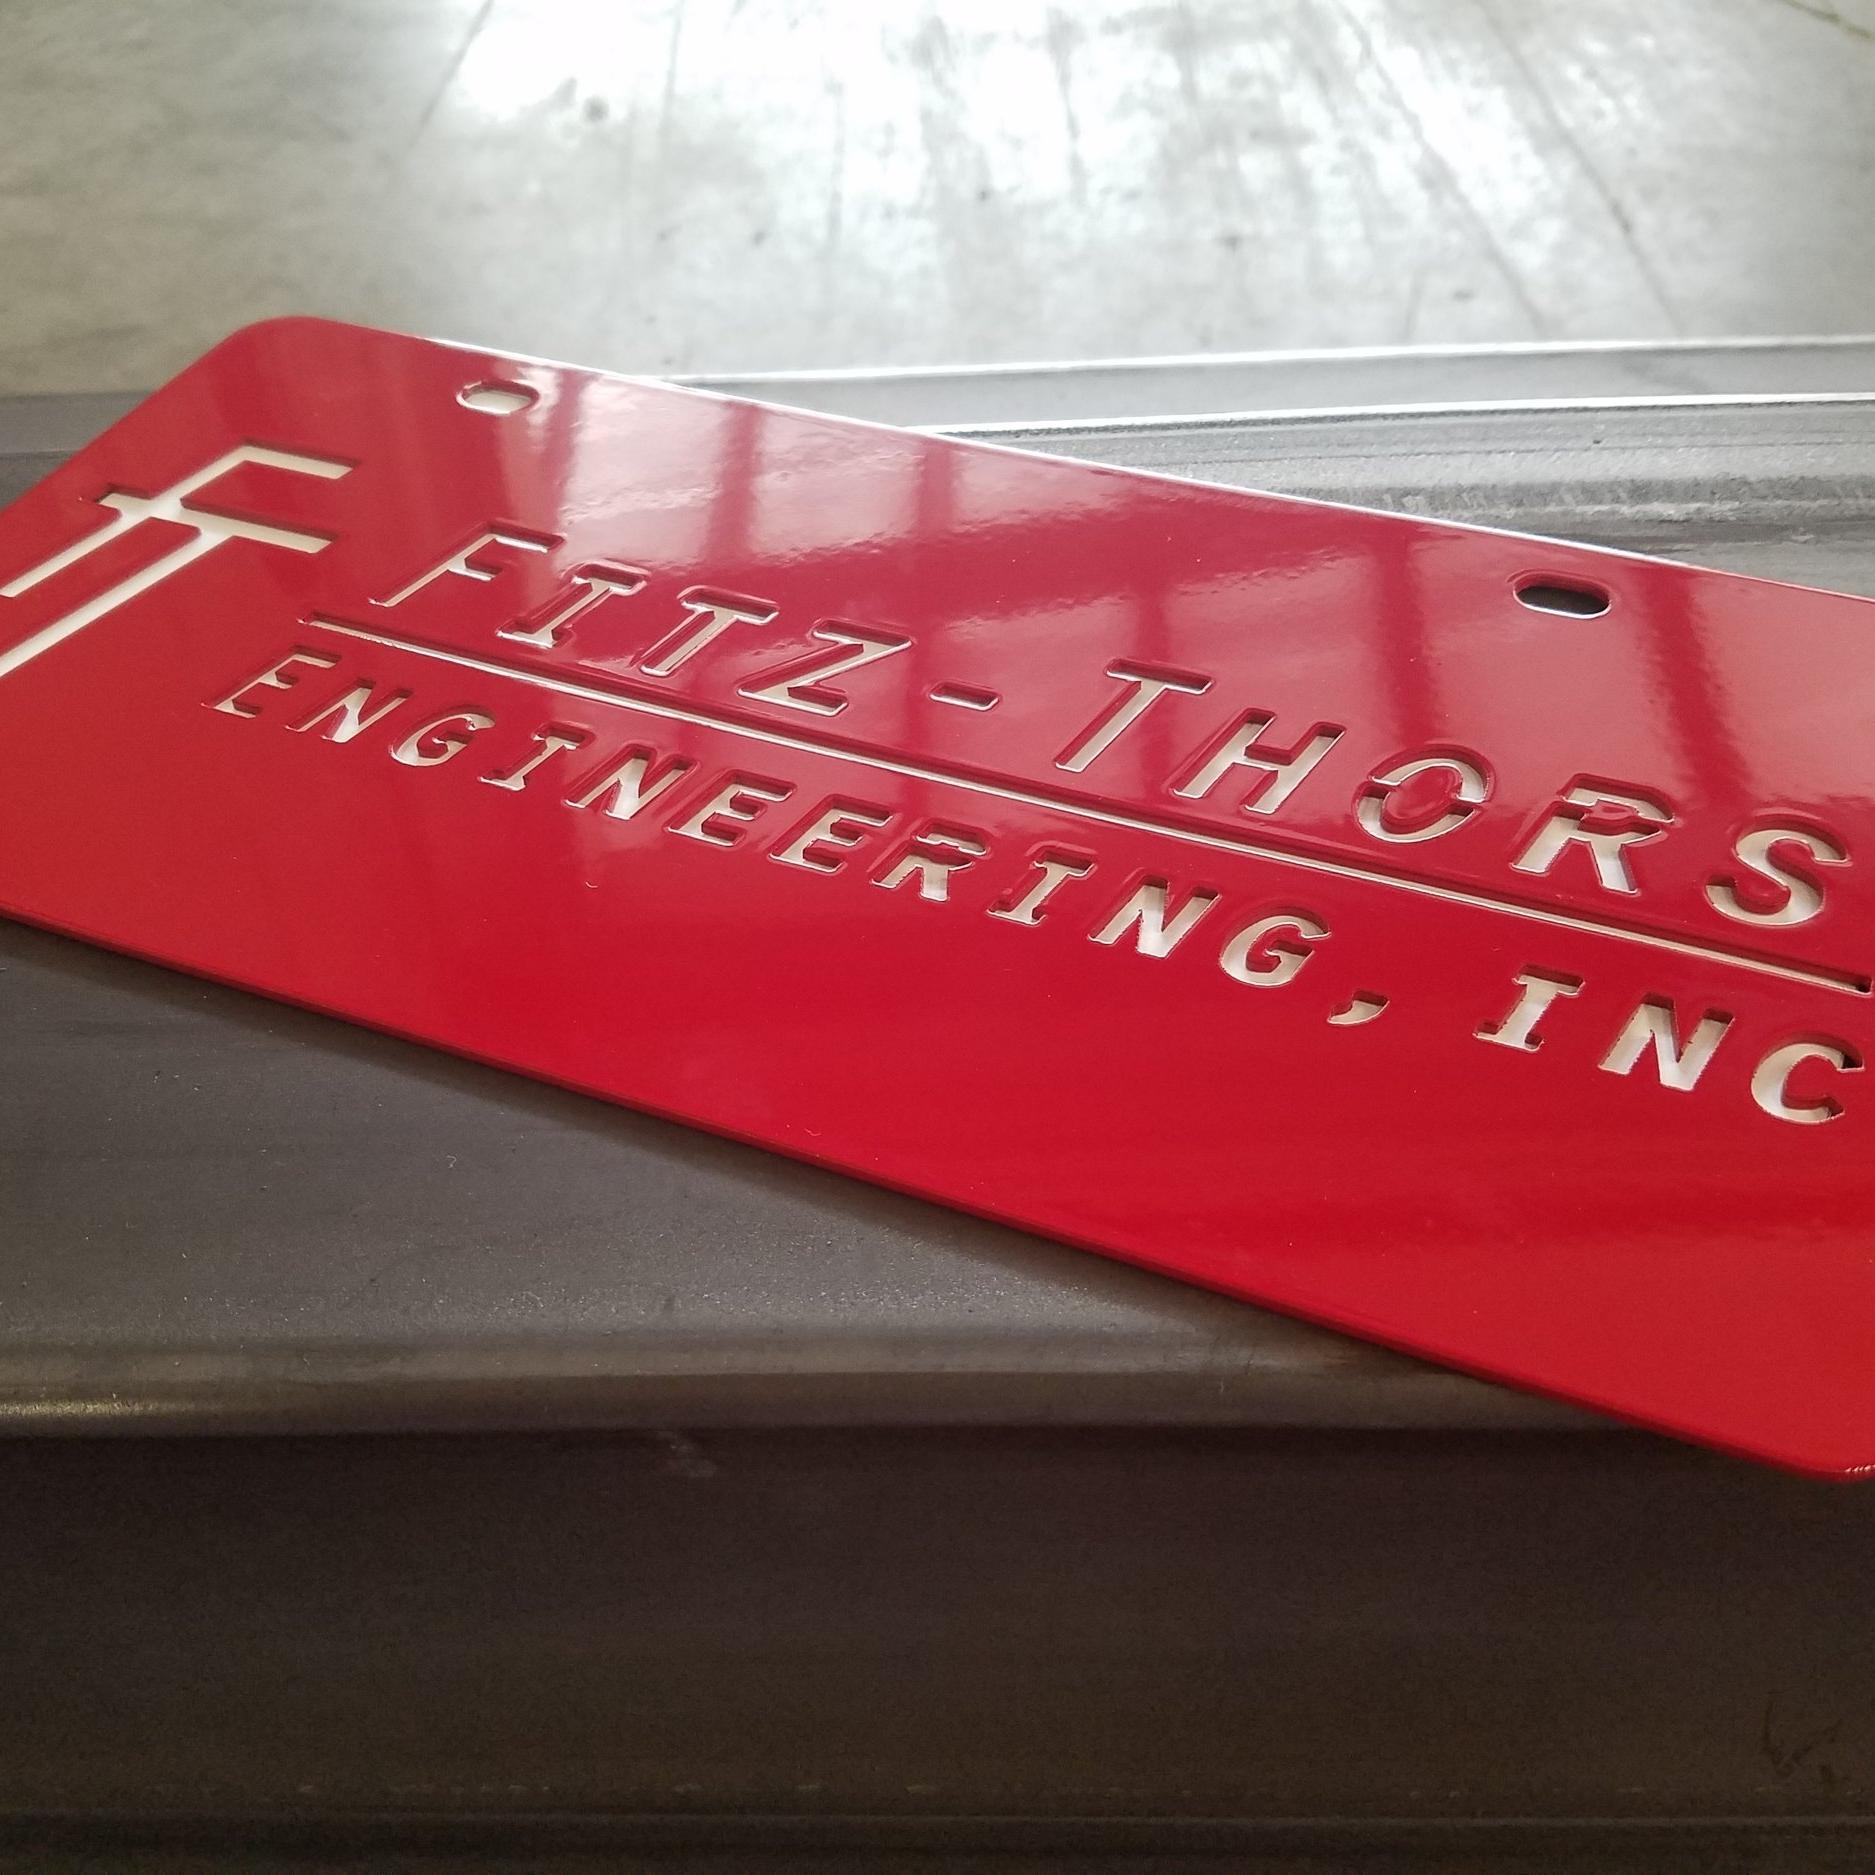 Fitz-Thors-Engineering_manufacturing_waterjet_logo_license-plate-2.jpg